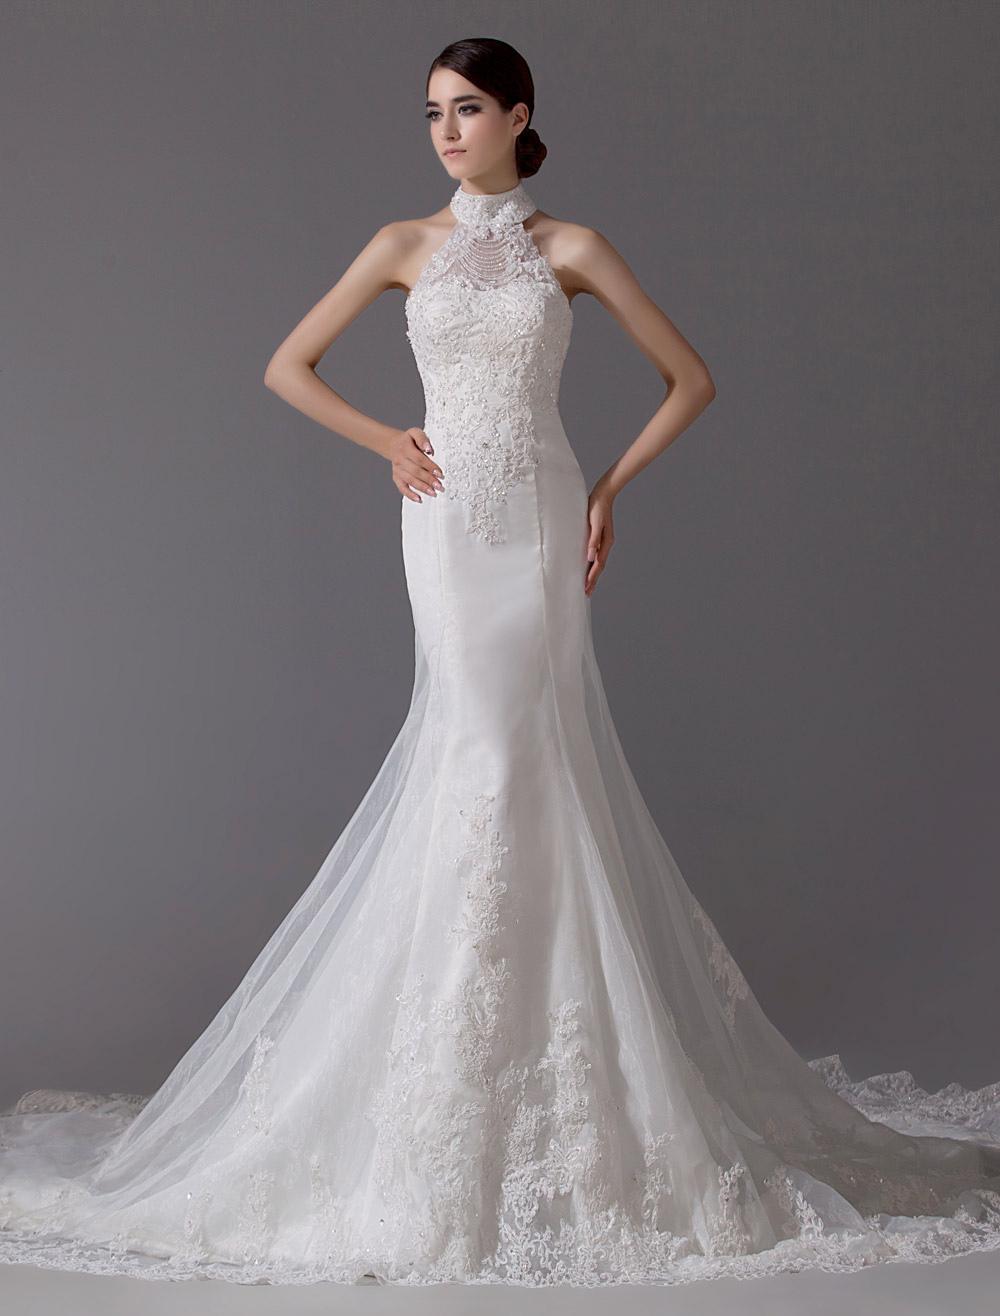 Ivory Wedding Dress Mermaid Backless Beaded Lace Up